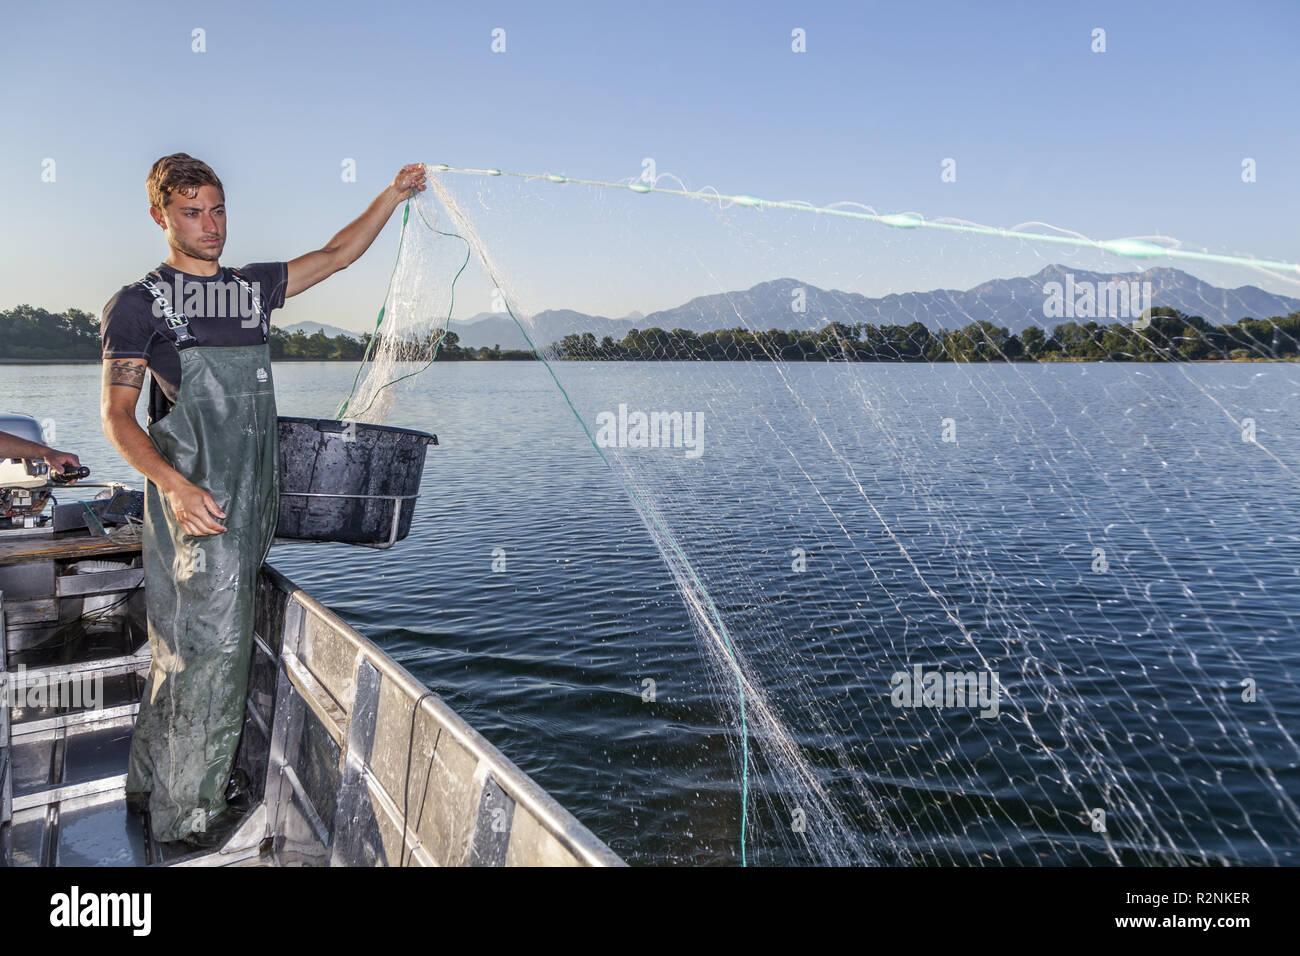 Fishermen Thomas and Florian Lex from Fraueninsel laying nets, Frauenchiemsee, Chiemgau, Upper Bavaria, Bavaria, Southern Germany, Germany, Europe - Stock Image